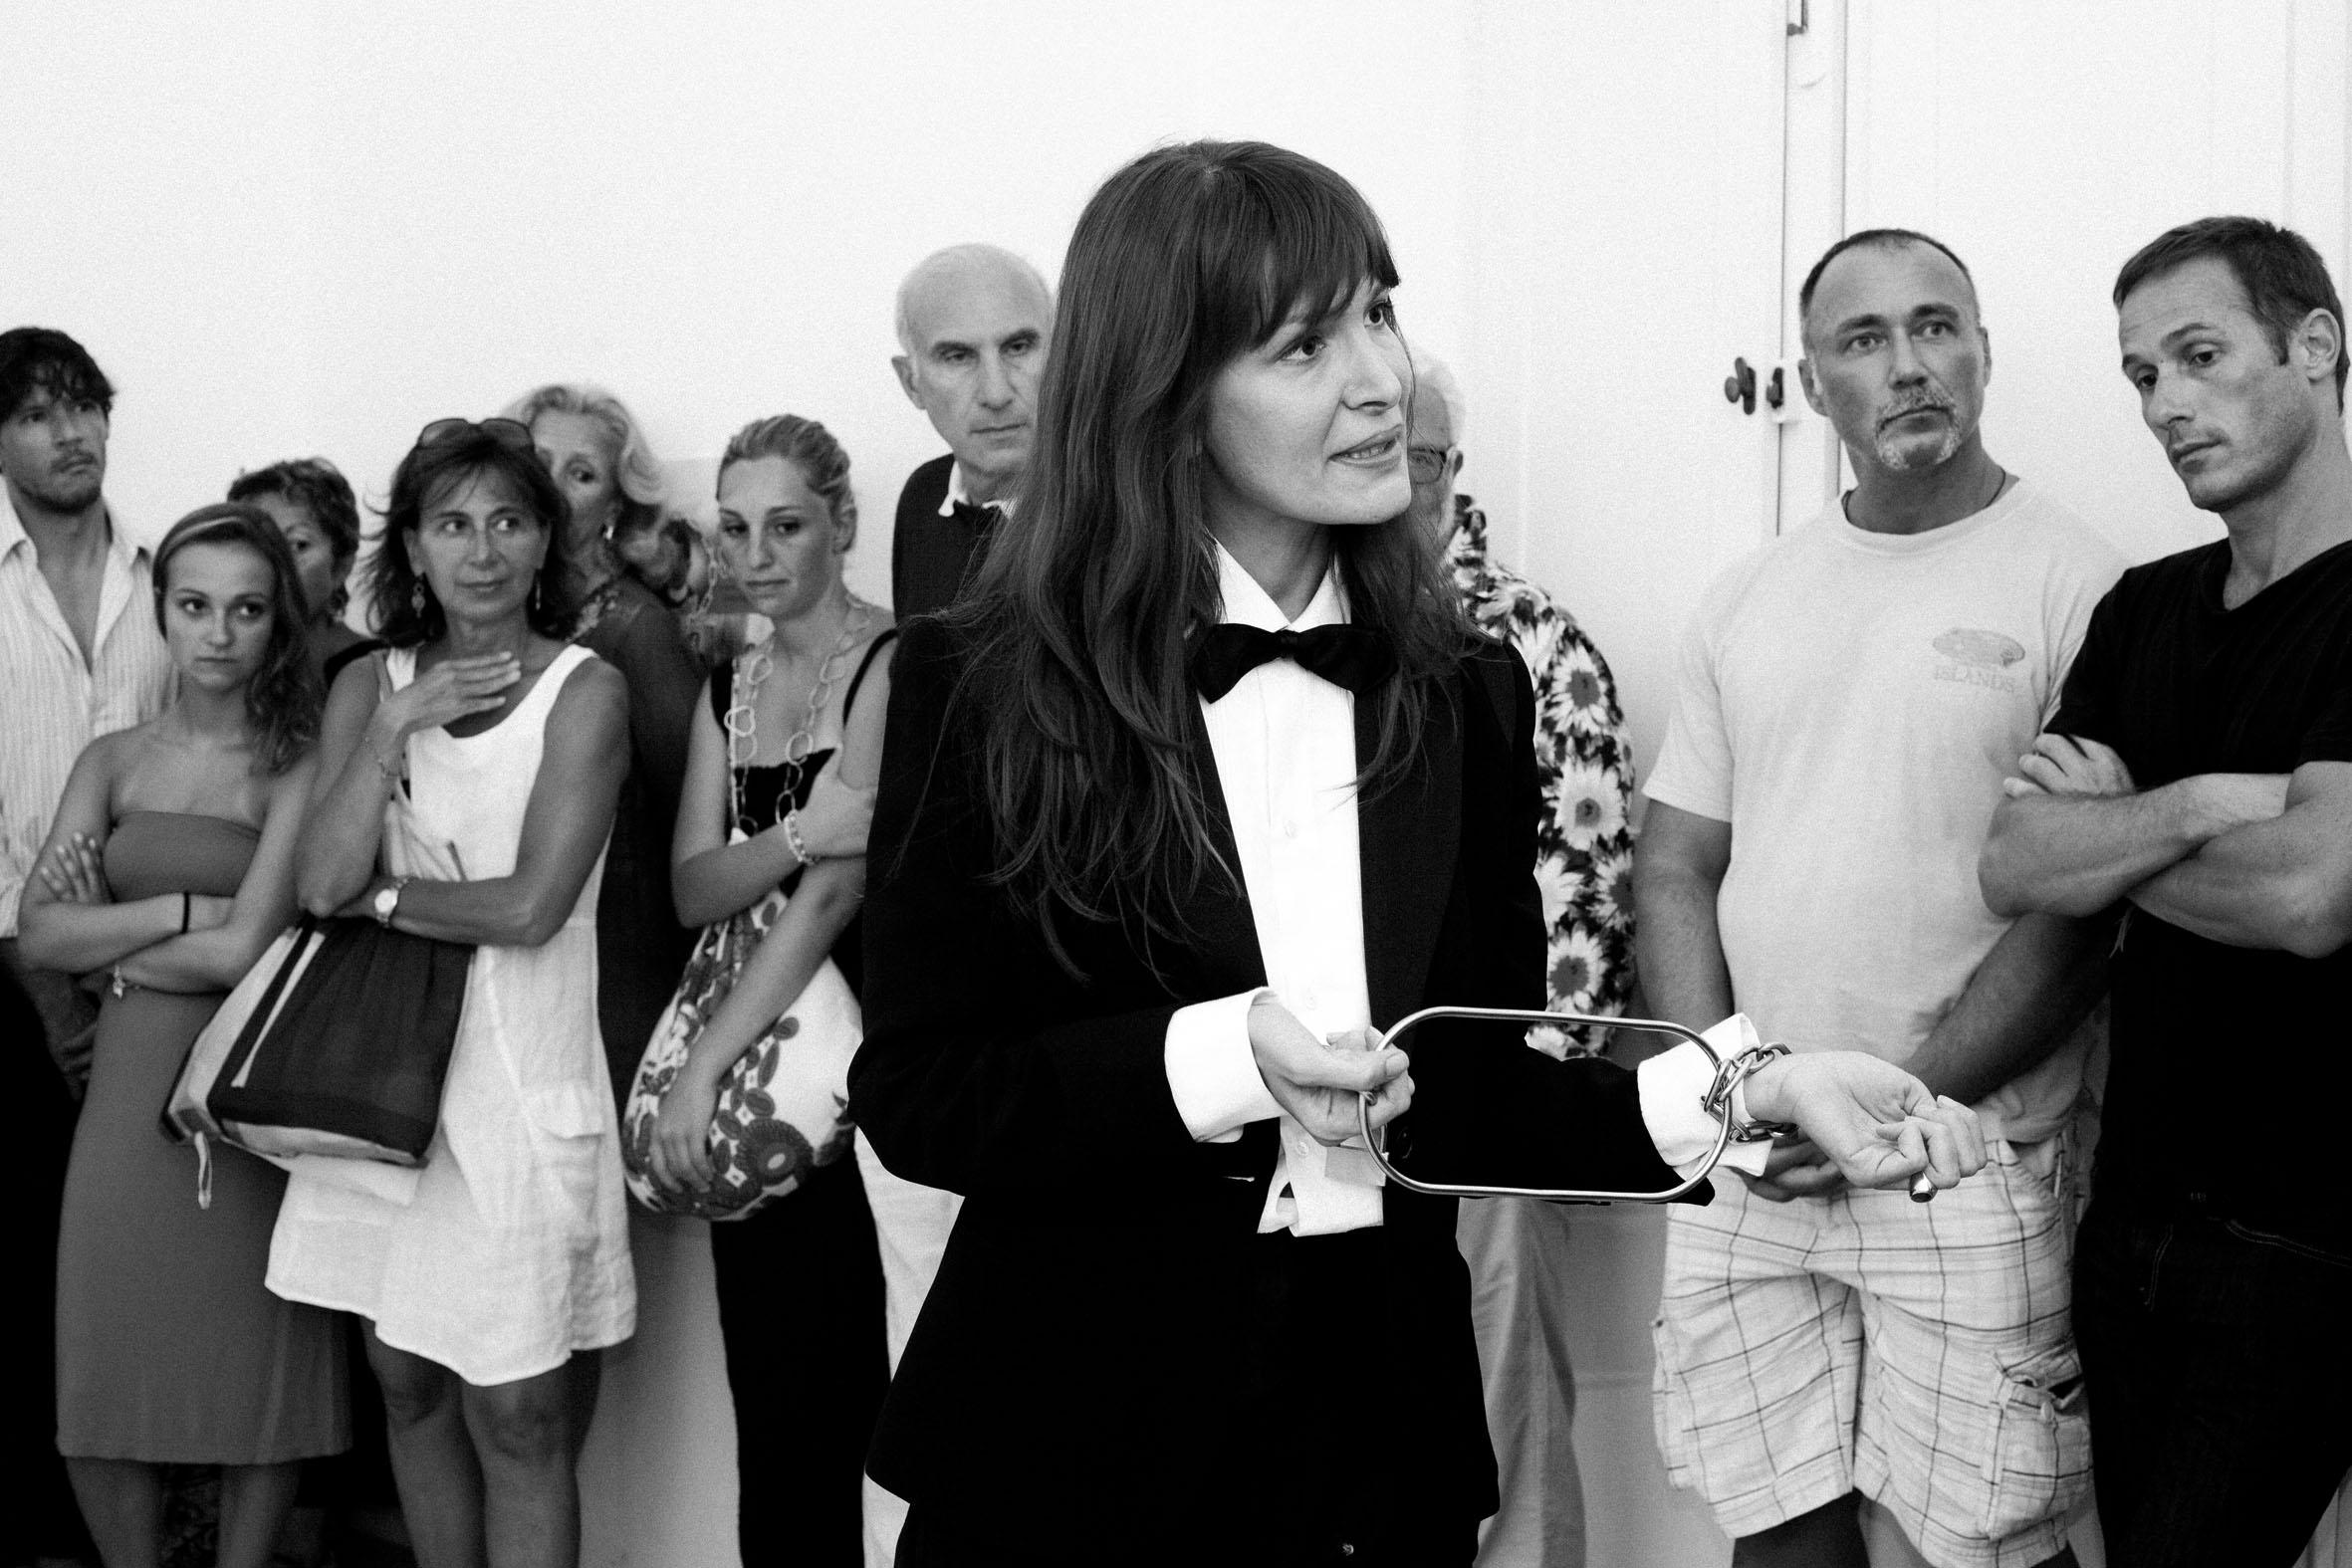 Chiara Fumai con Harry Houdini, Free like the speech of a Socialist, live performance, 15 agosto 2011. Ph. Matthew Stone